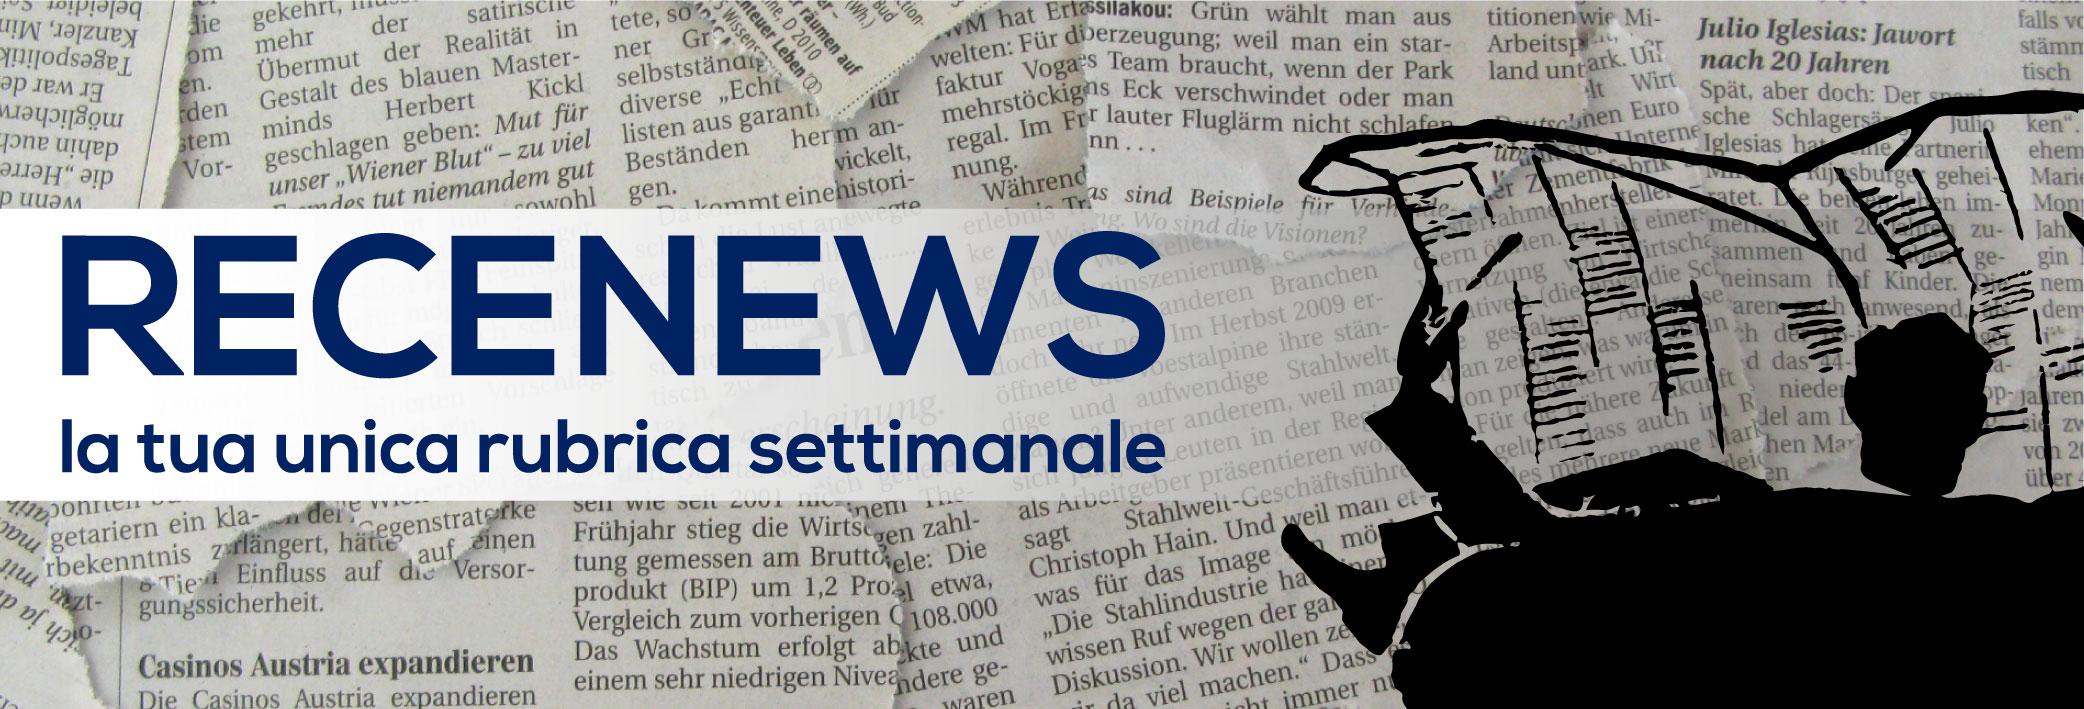 Recenews_news settimanali